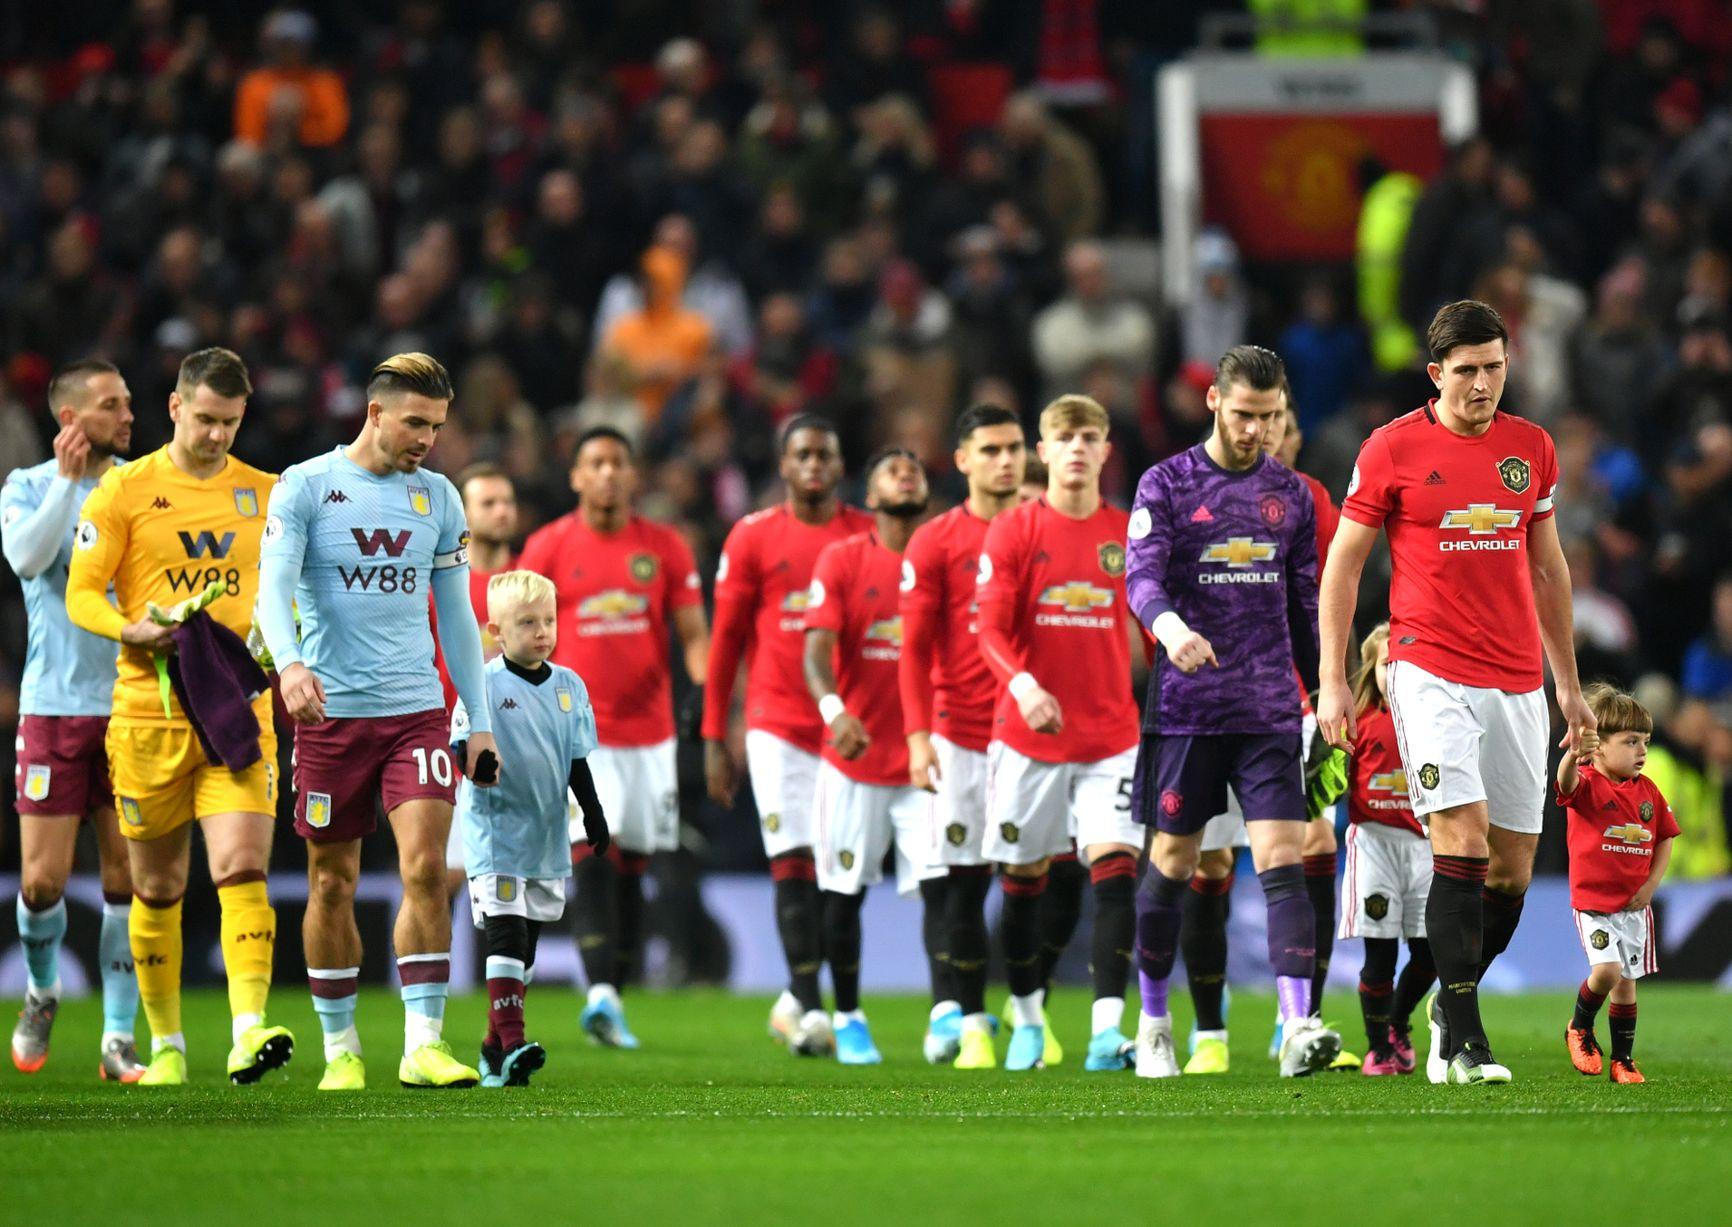 Match preview: Aston Villa vs Manchester United – utdreport